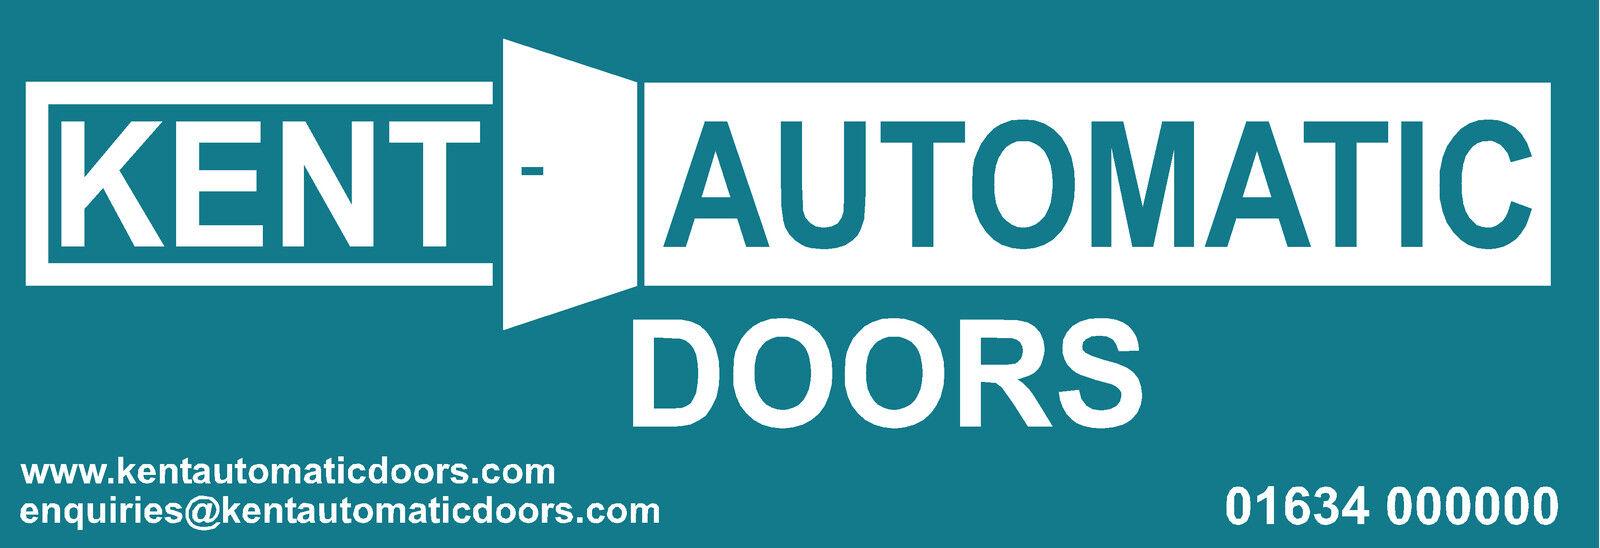 Kent Automatic Door Spares Ltd